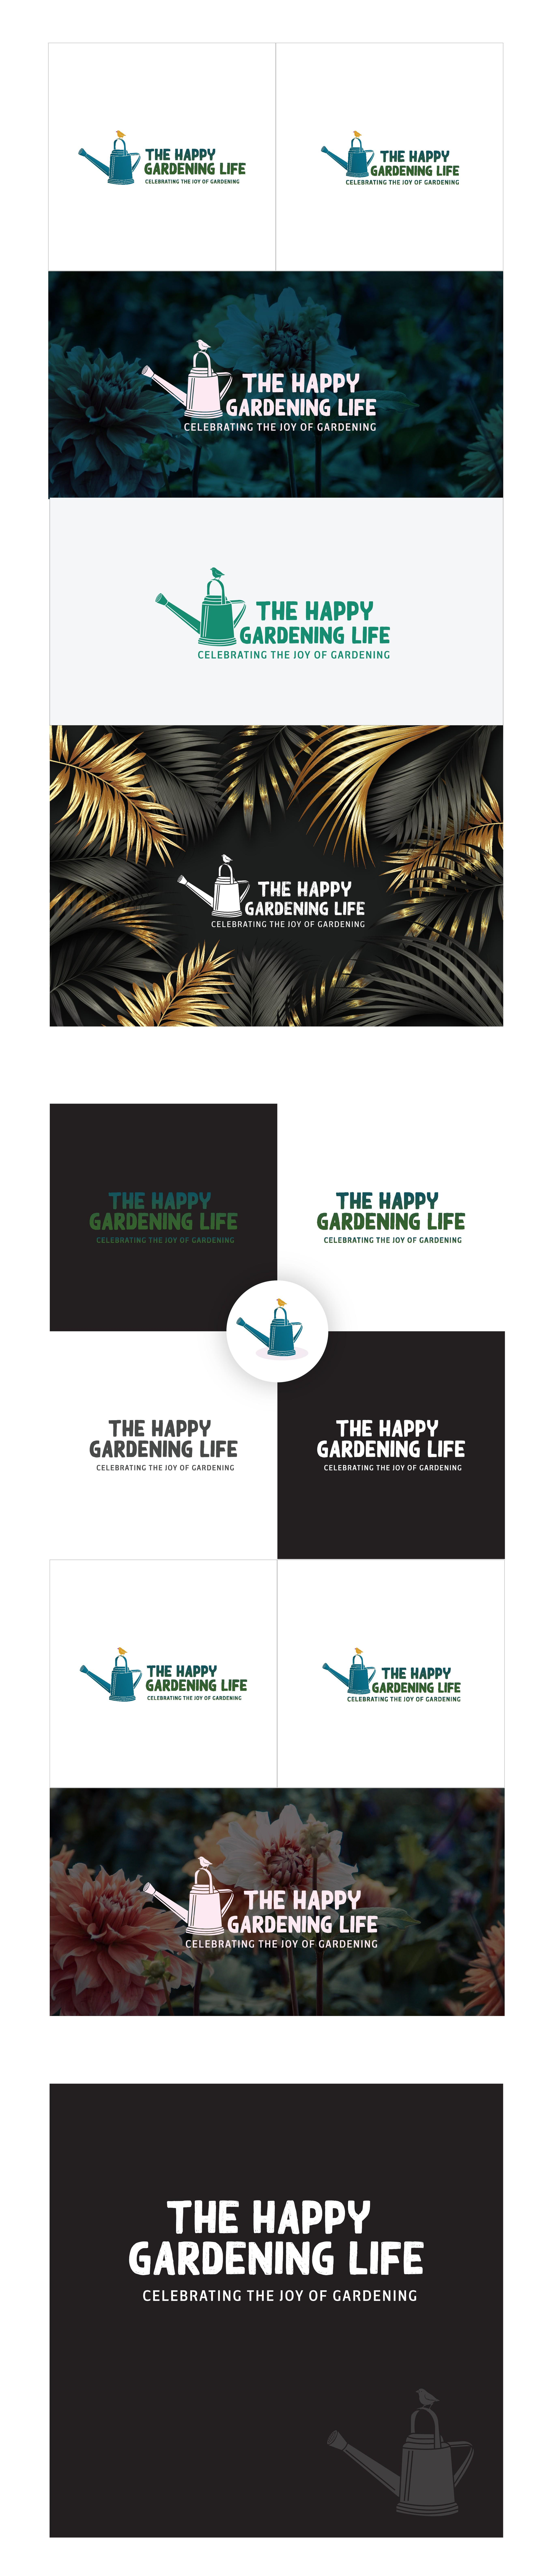 The Happy Gardening Life Logo Refresh